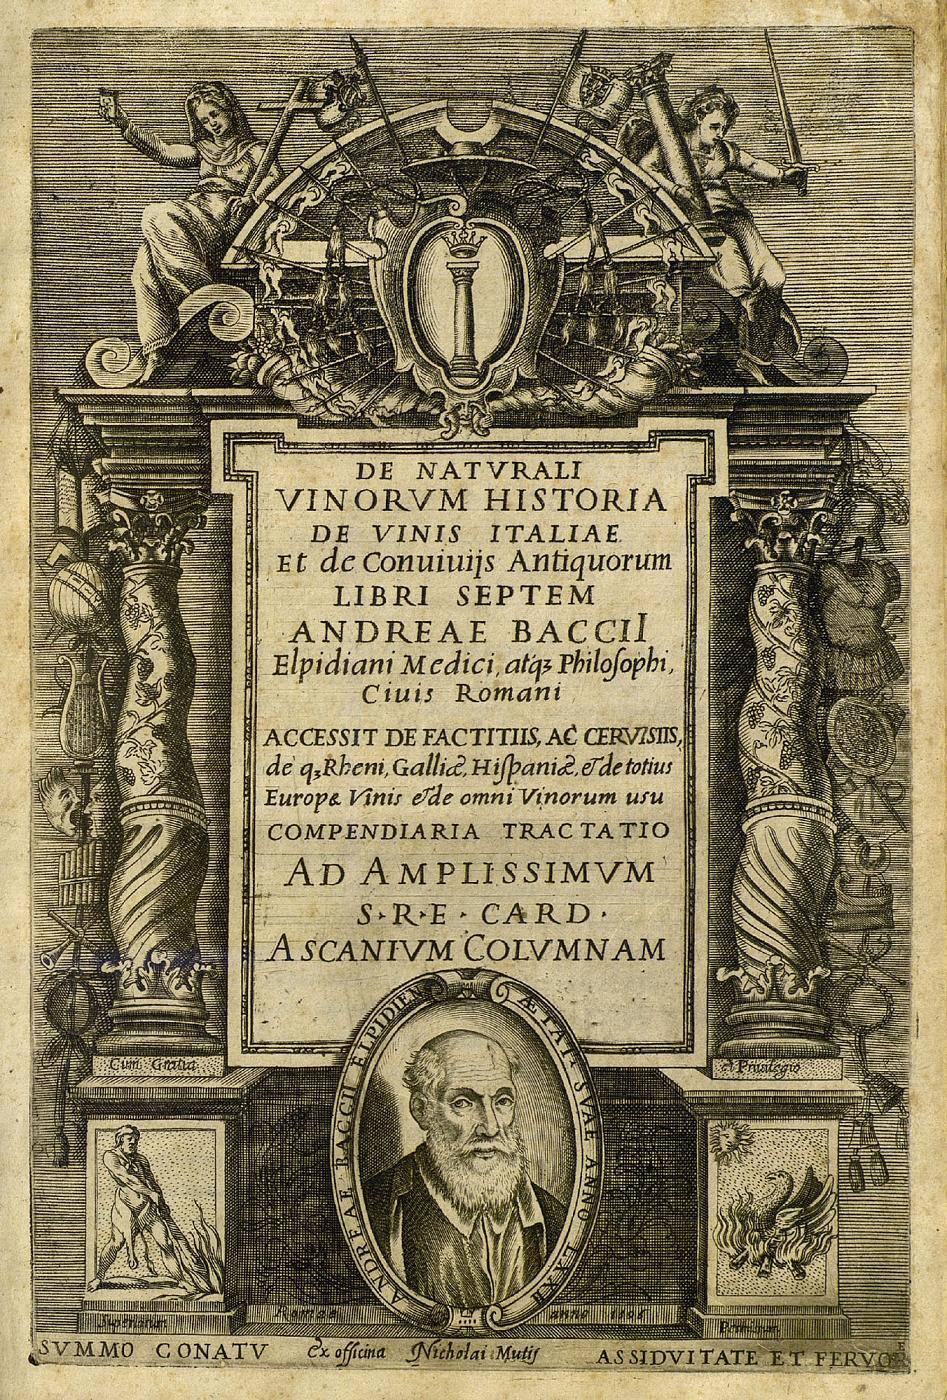 Andrea Bacci's De naturali vinorum historia et de vinis Italiae